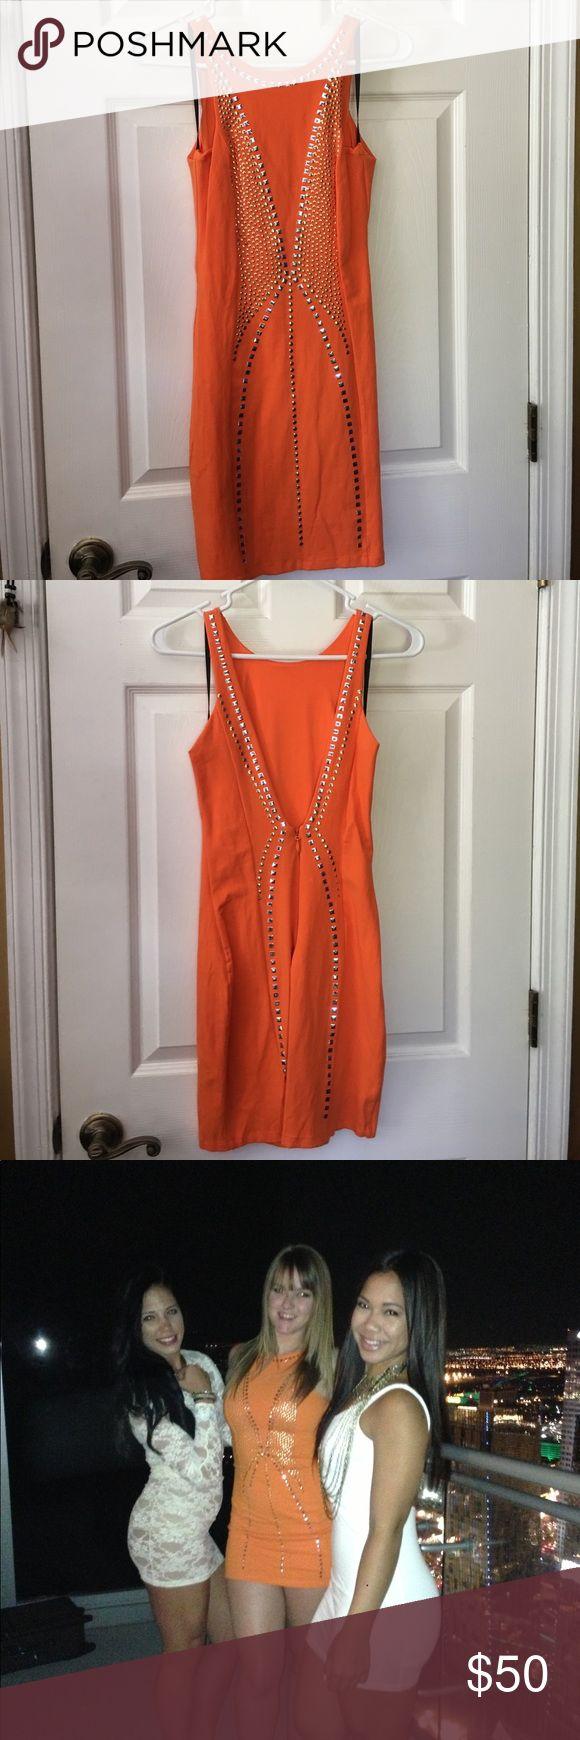 Best 25 orange mini dresses ideas on pinterest orange cocktail orange bebe mini dress ombrellifo Images